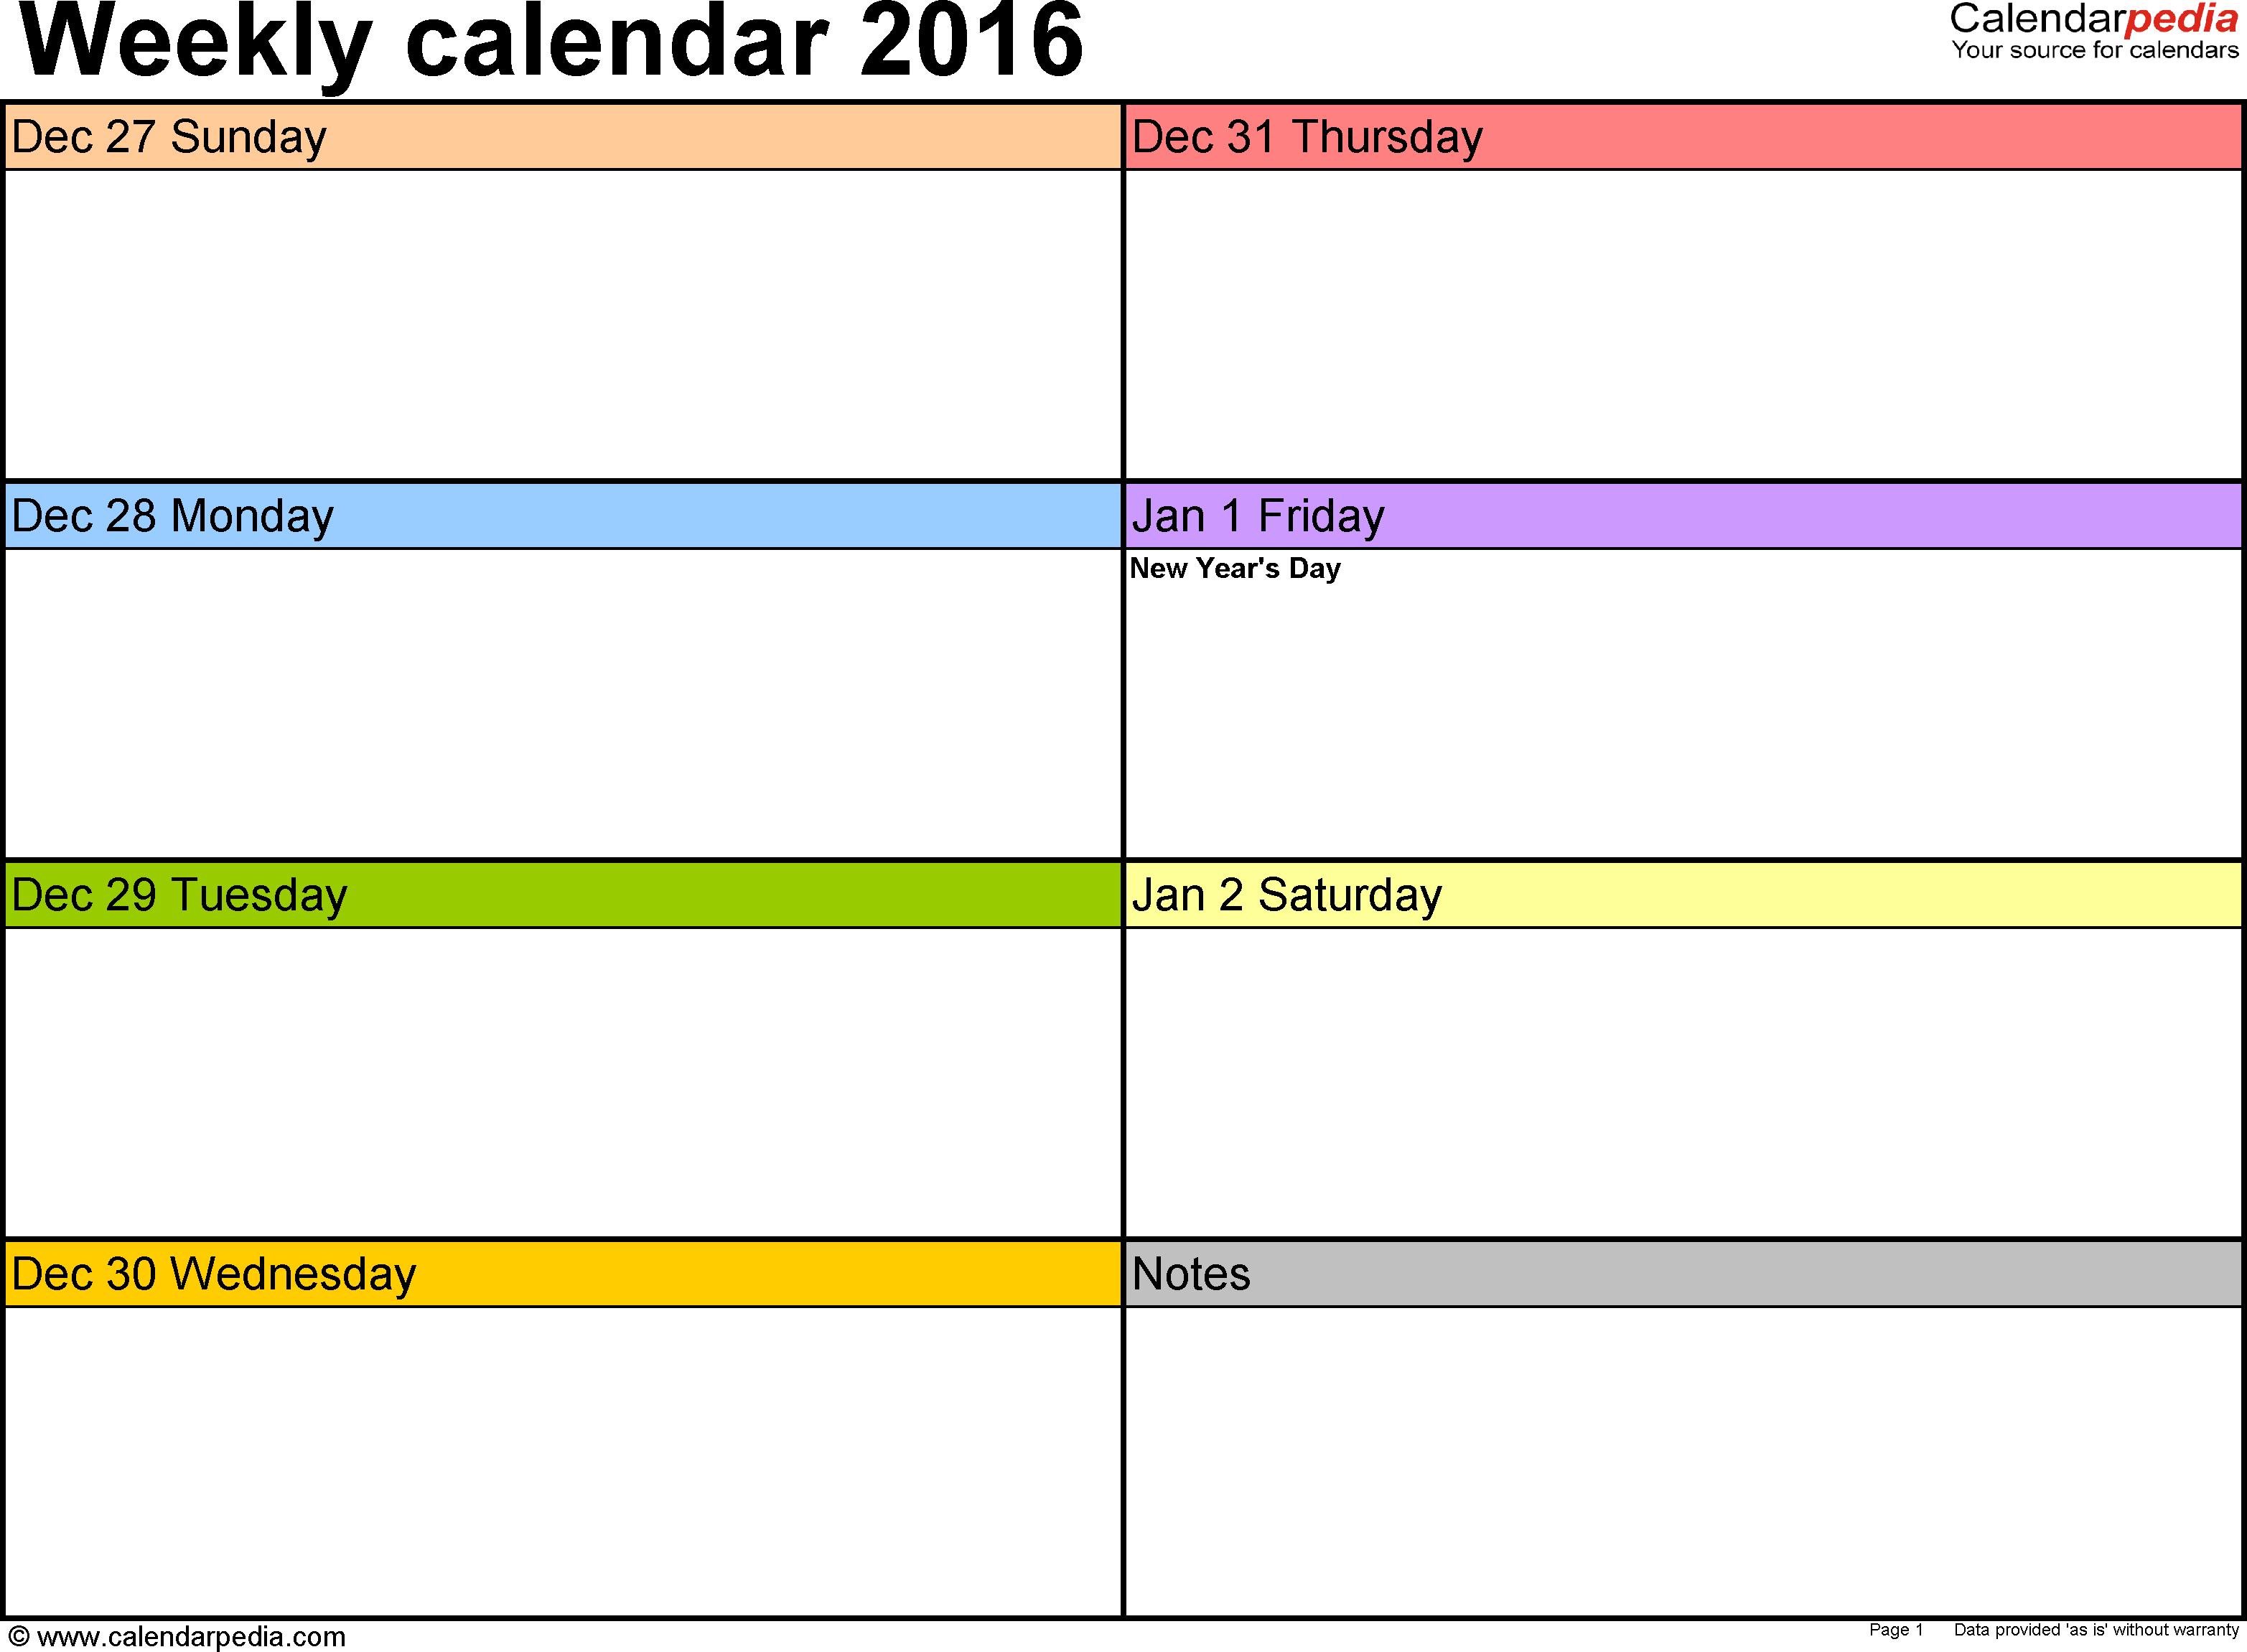 Weekly Calendar 2016 For Pdf - 12 Free Printable Templates - Free Printable Pocket Planner 2016